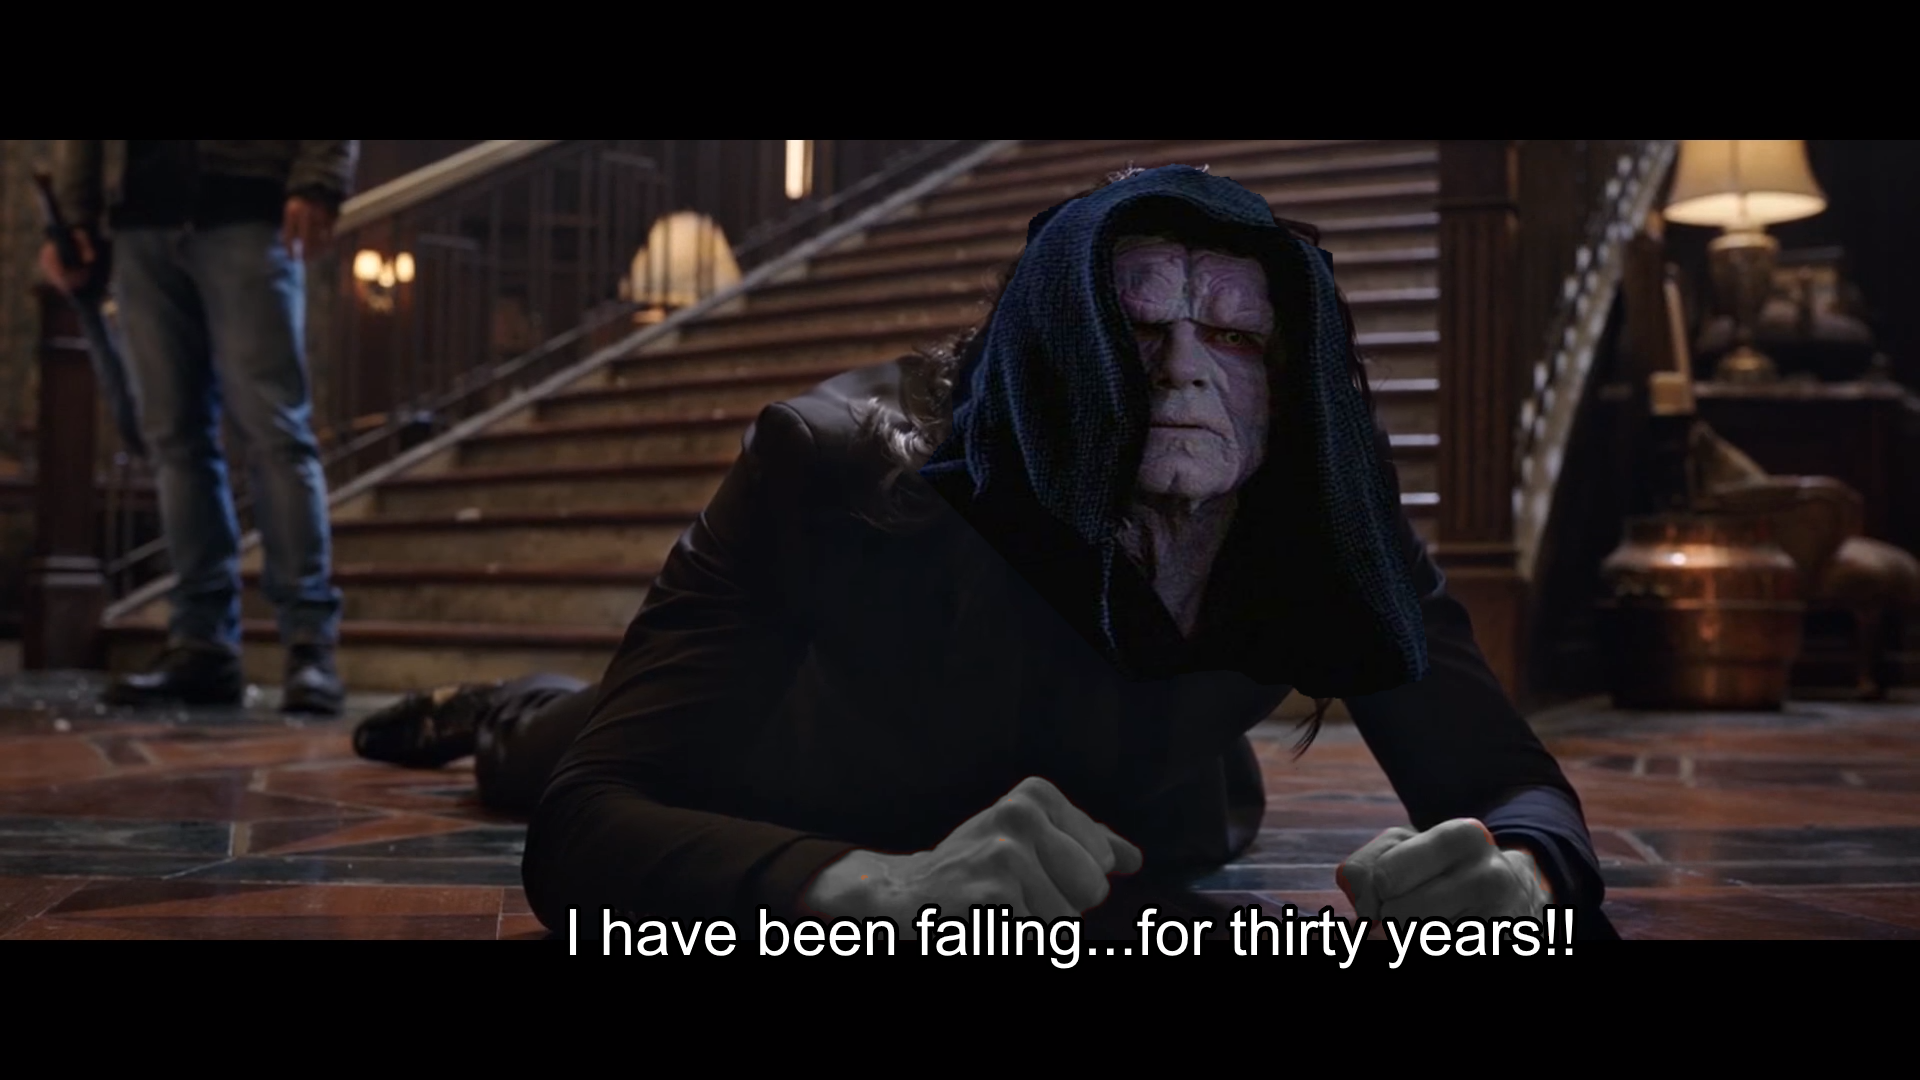 Episode Ix Behind The Scenes Star Wars In 2021 Star Wars Memes Star Wars Star Wars Episodes